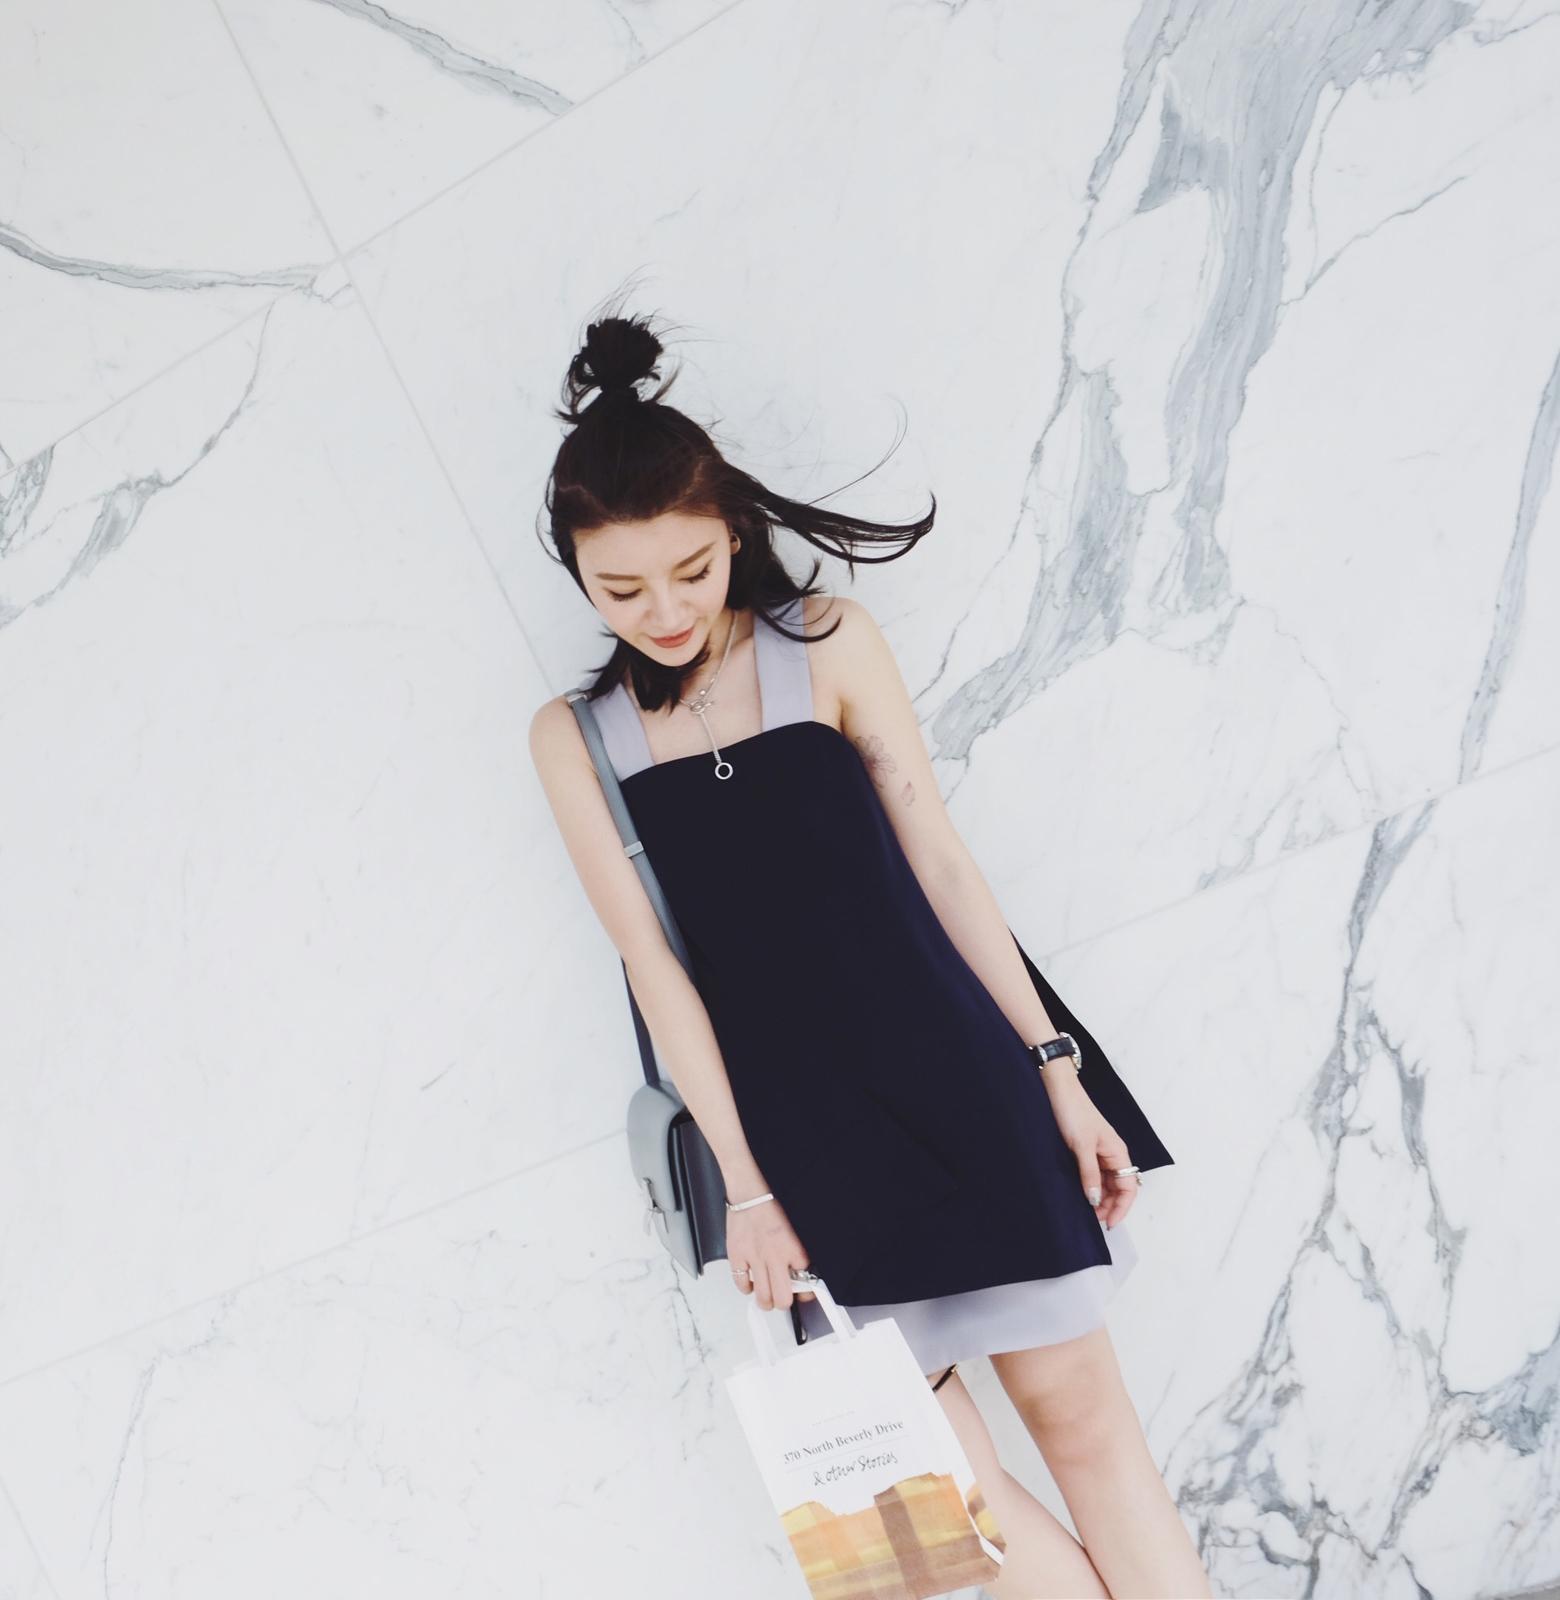 iWiNG 夏季新款 less is more气质配色交叉设计吊带连衣裙 女夏